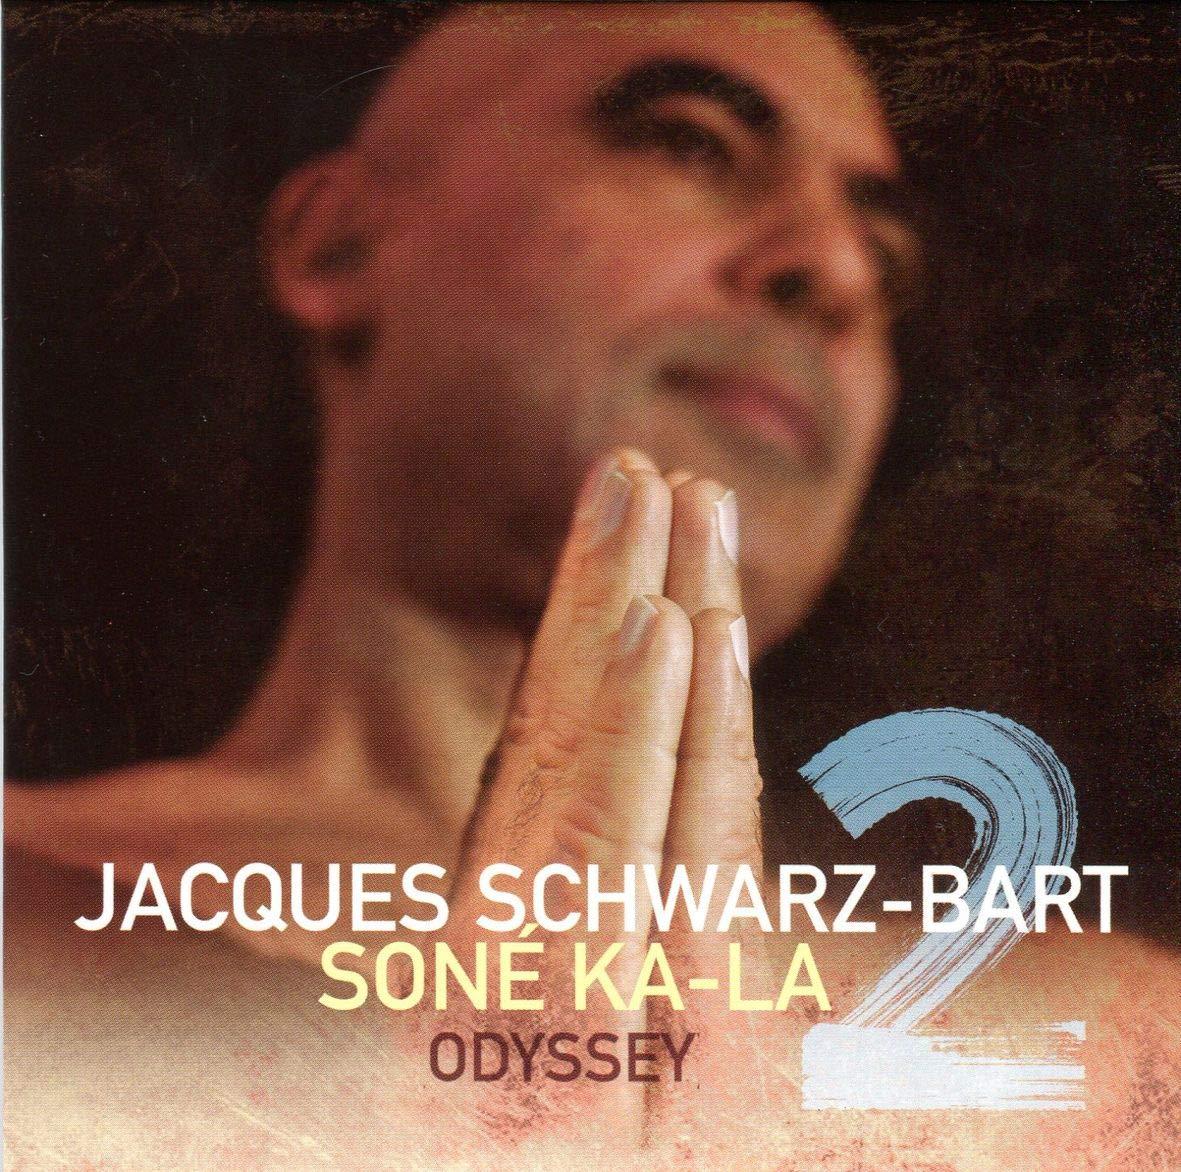 JACQUES SCHWARZ-BART - Soné Ka La 2 / Odyssey cover